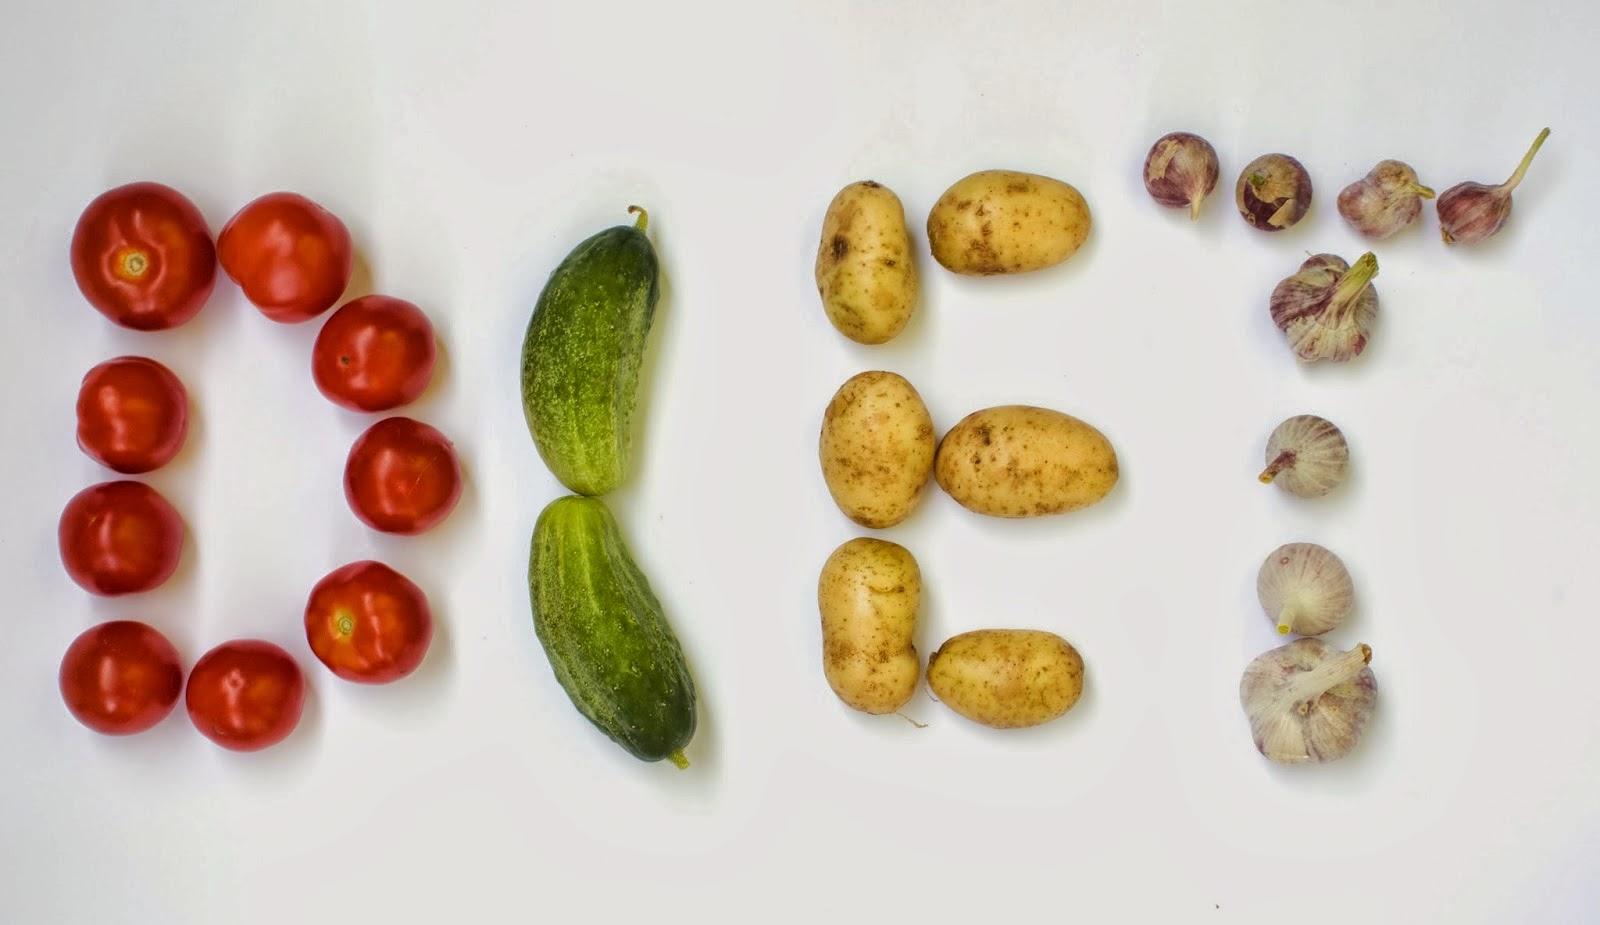 http://berita-21.blogspot.com/2014/04/tips-menurunkan-berat-badan-sehat-alami.html